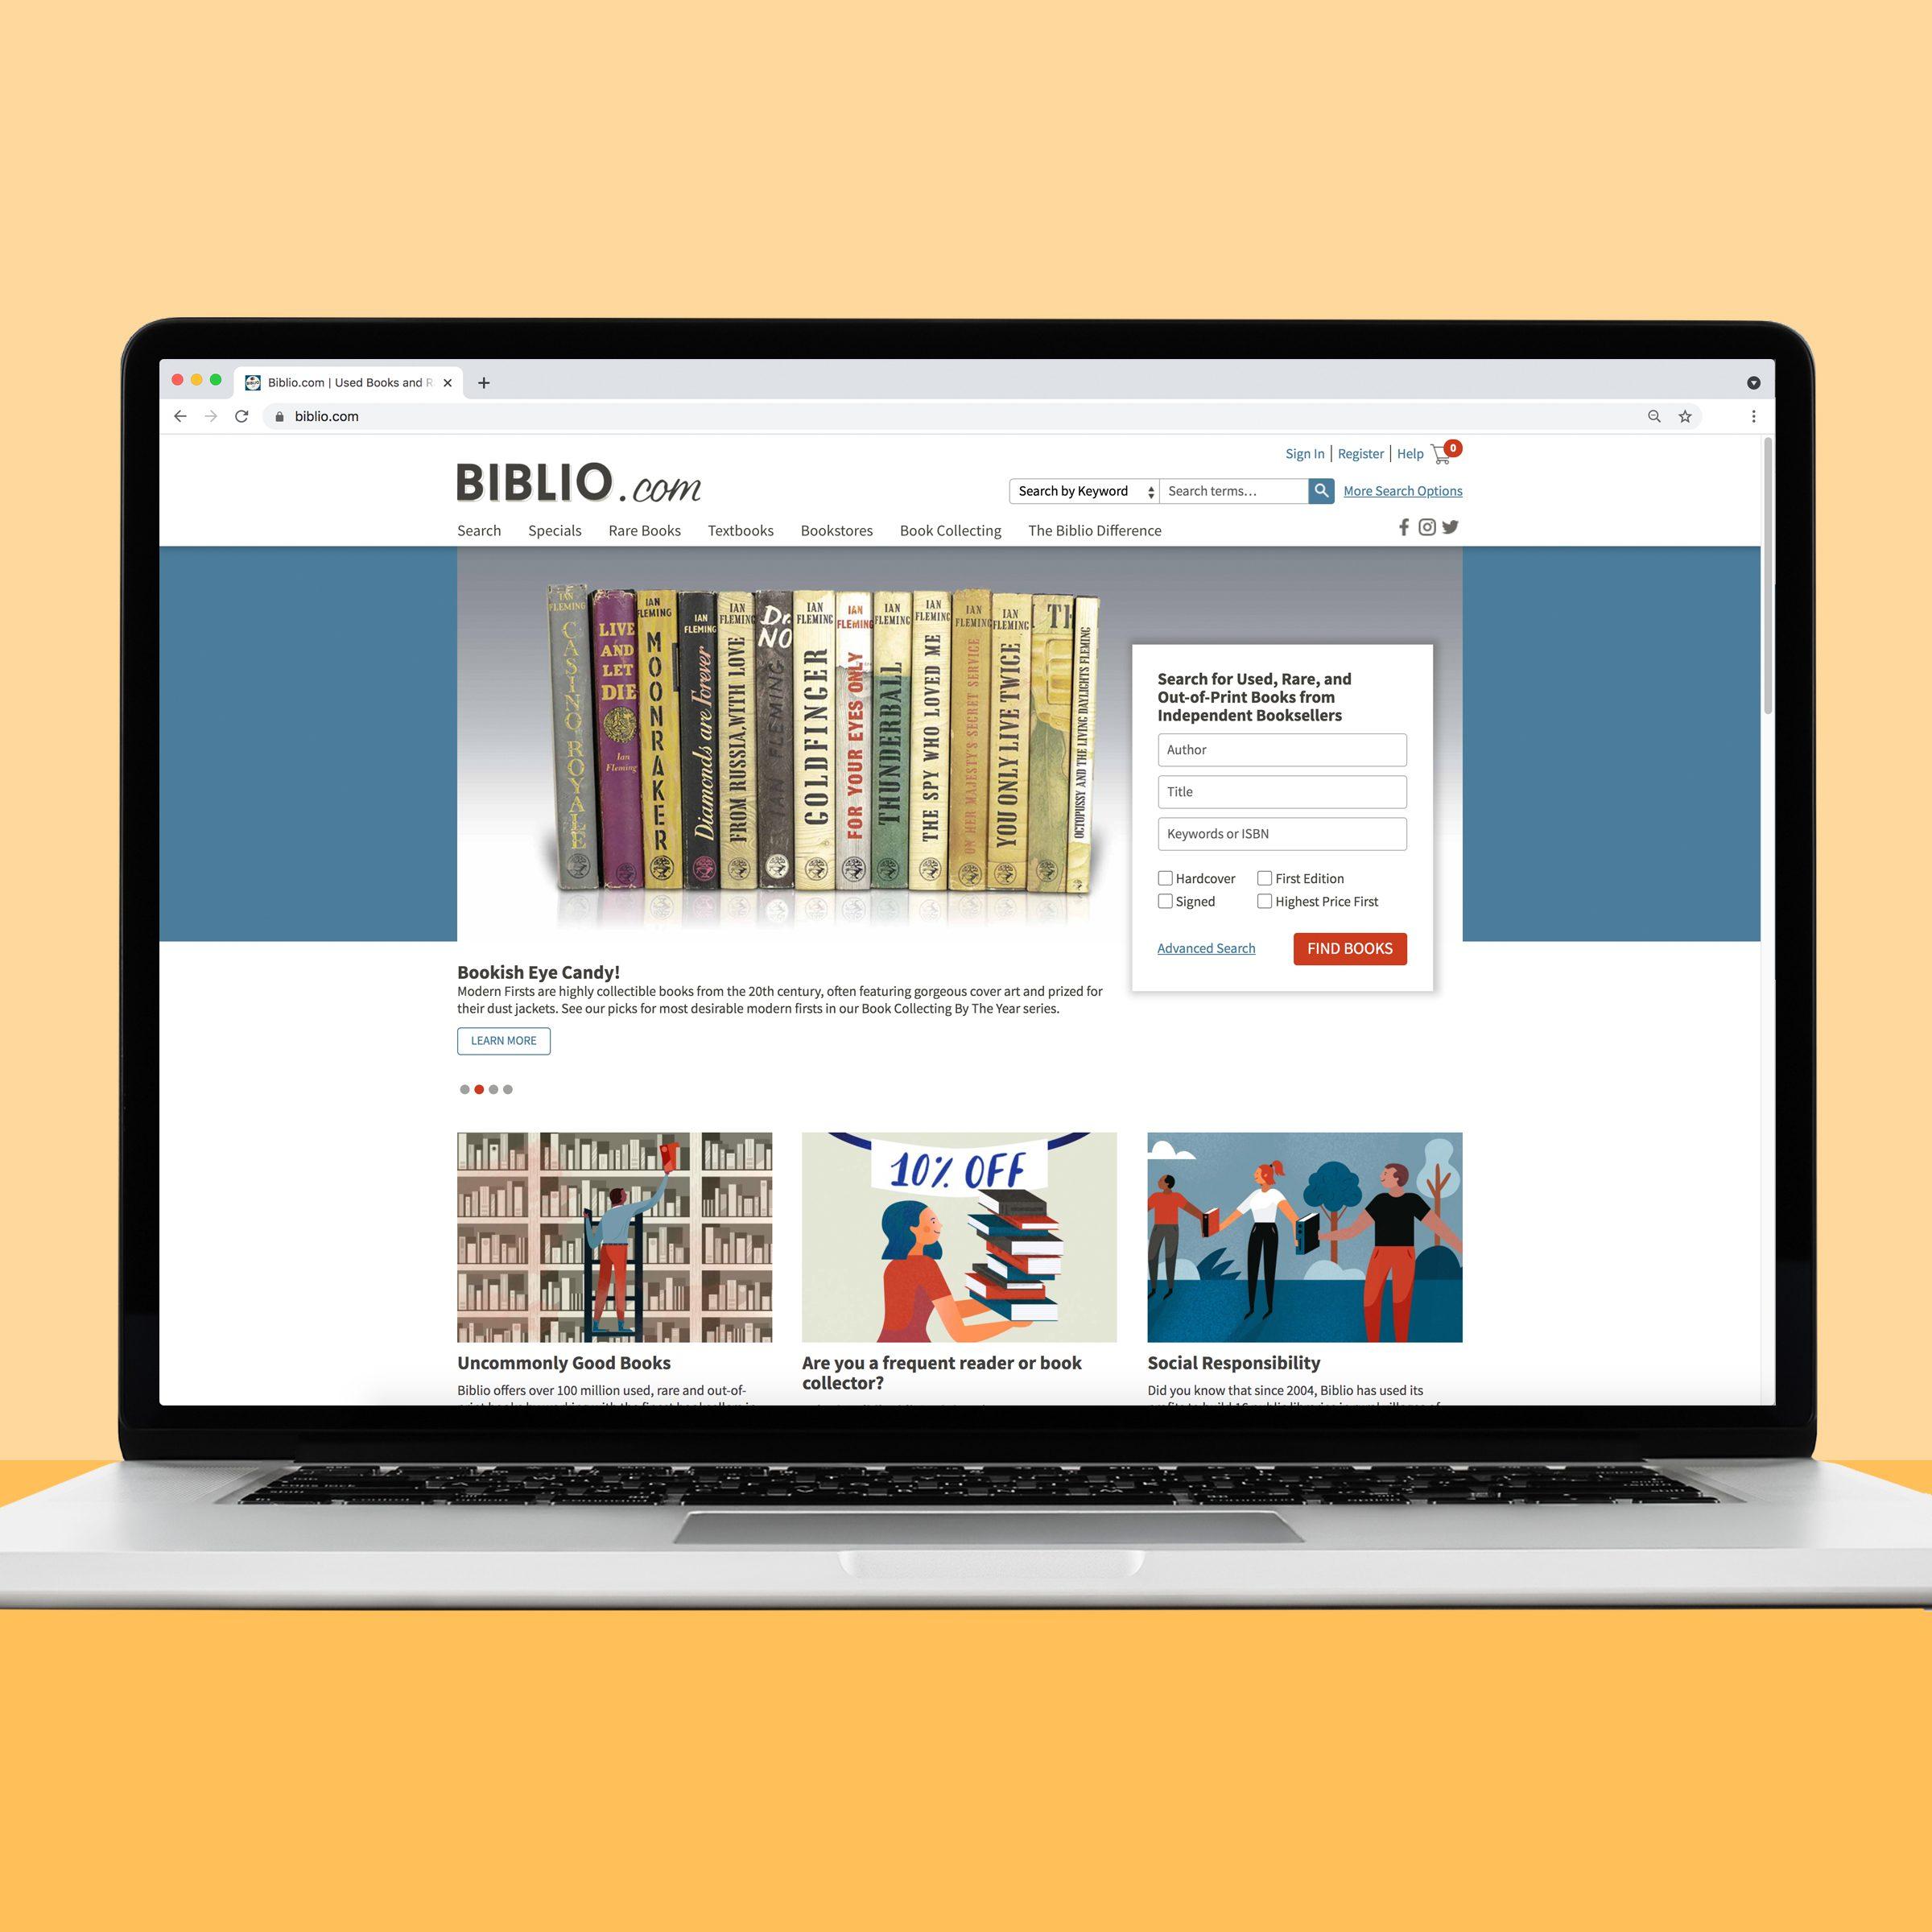 Biblio used book website